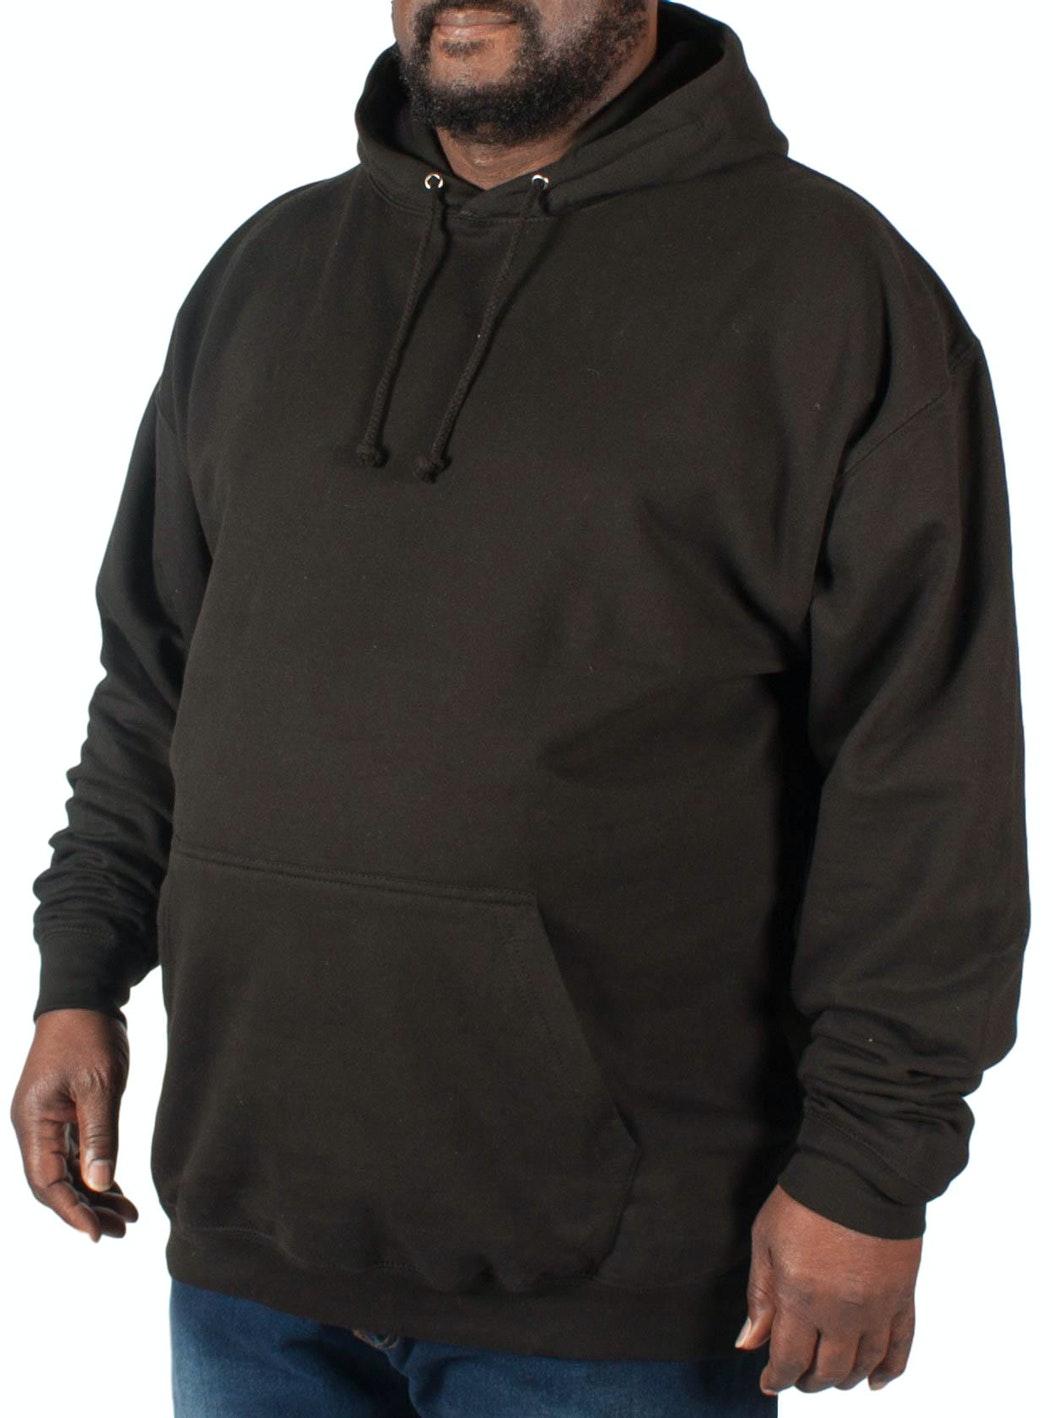 Awdis Classic Black Hoody